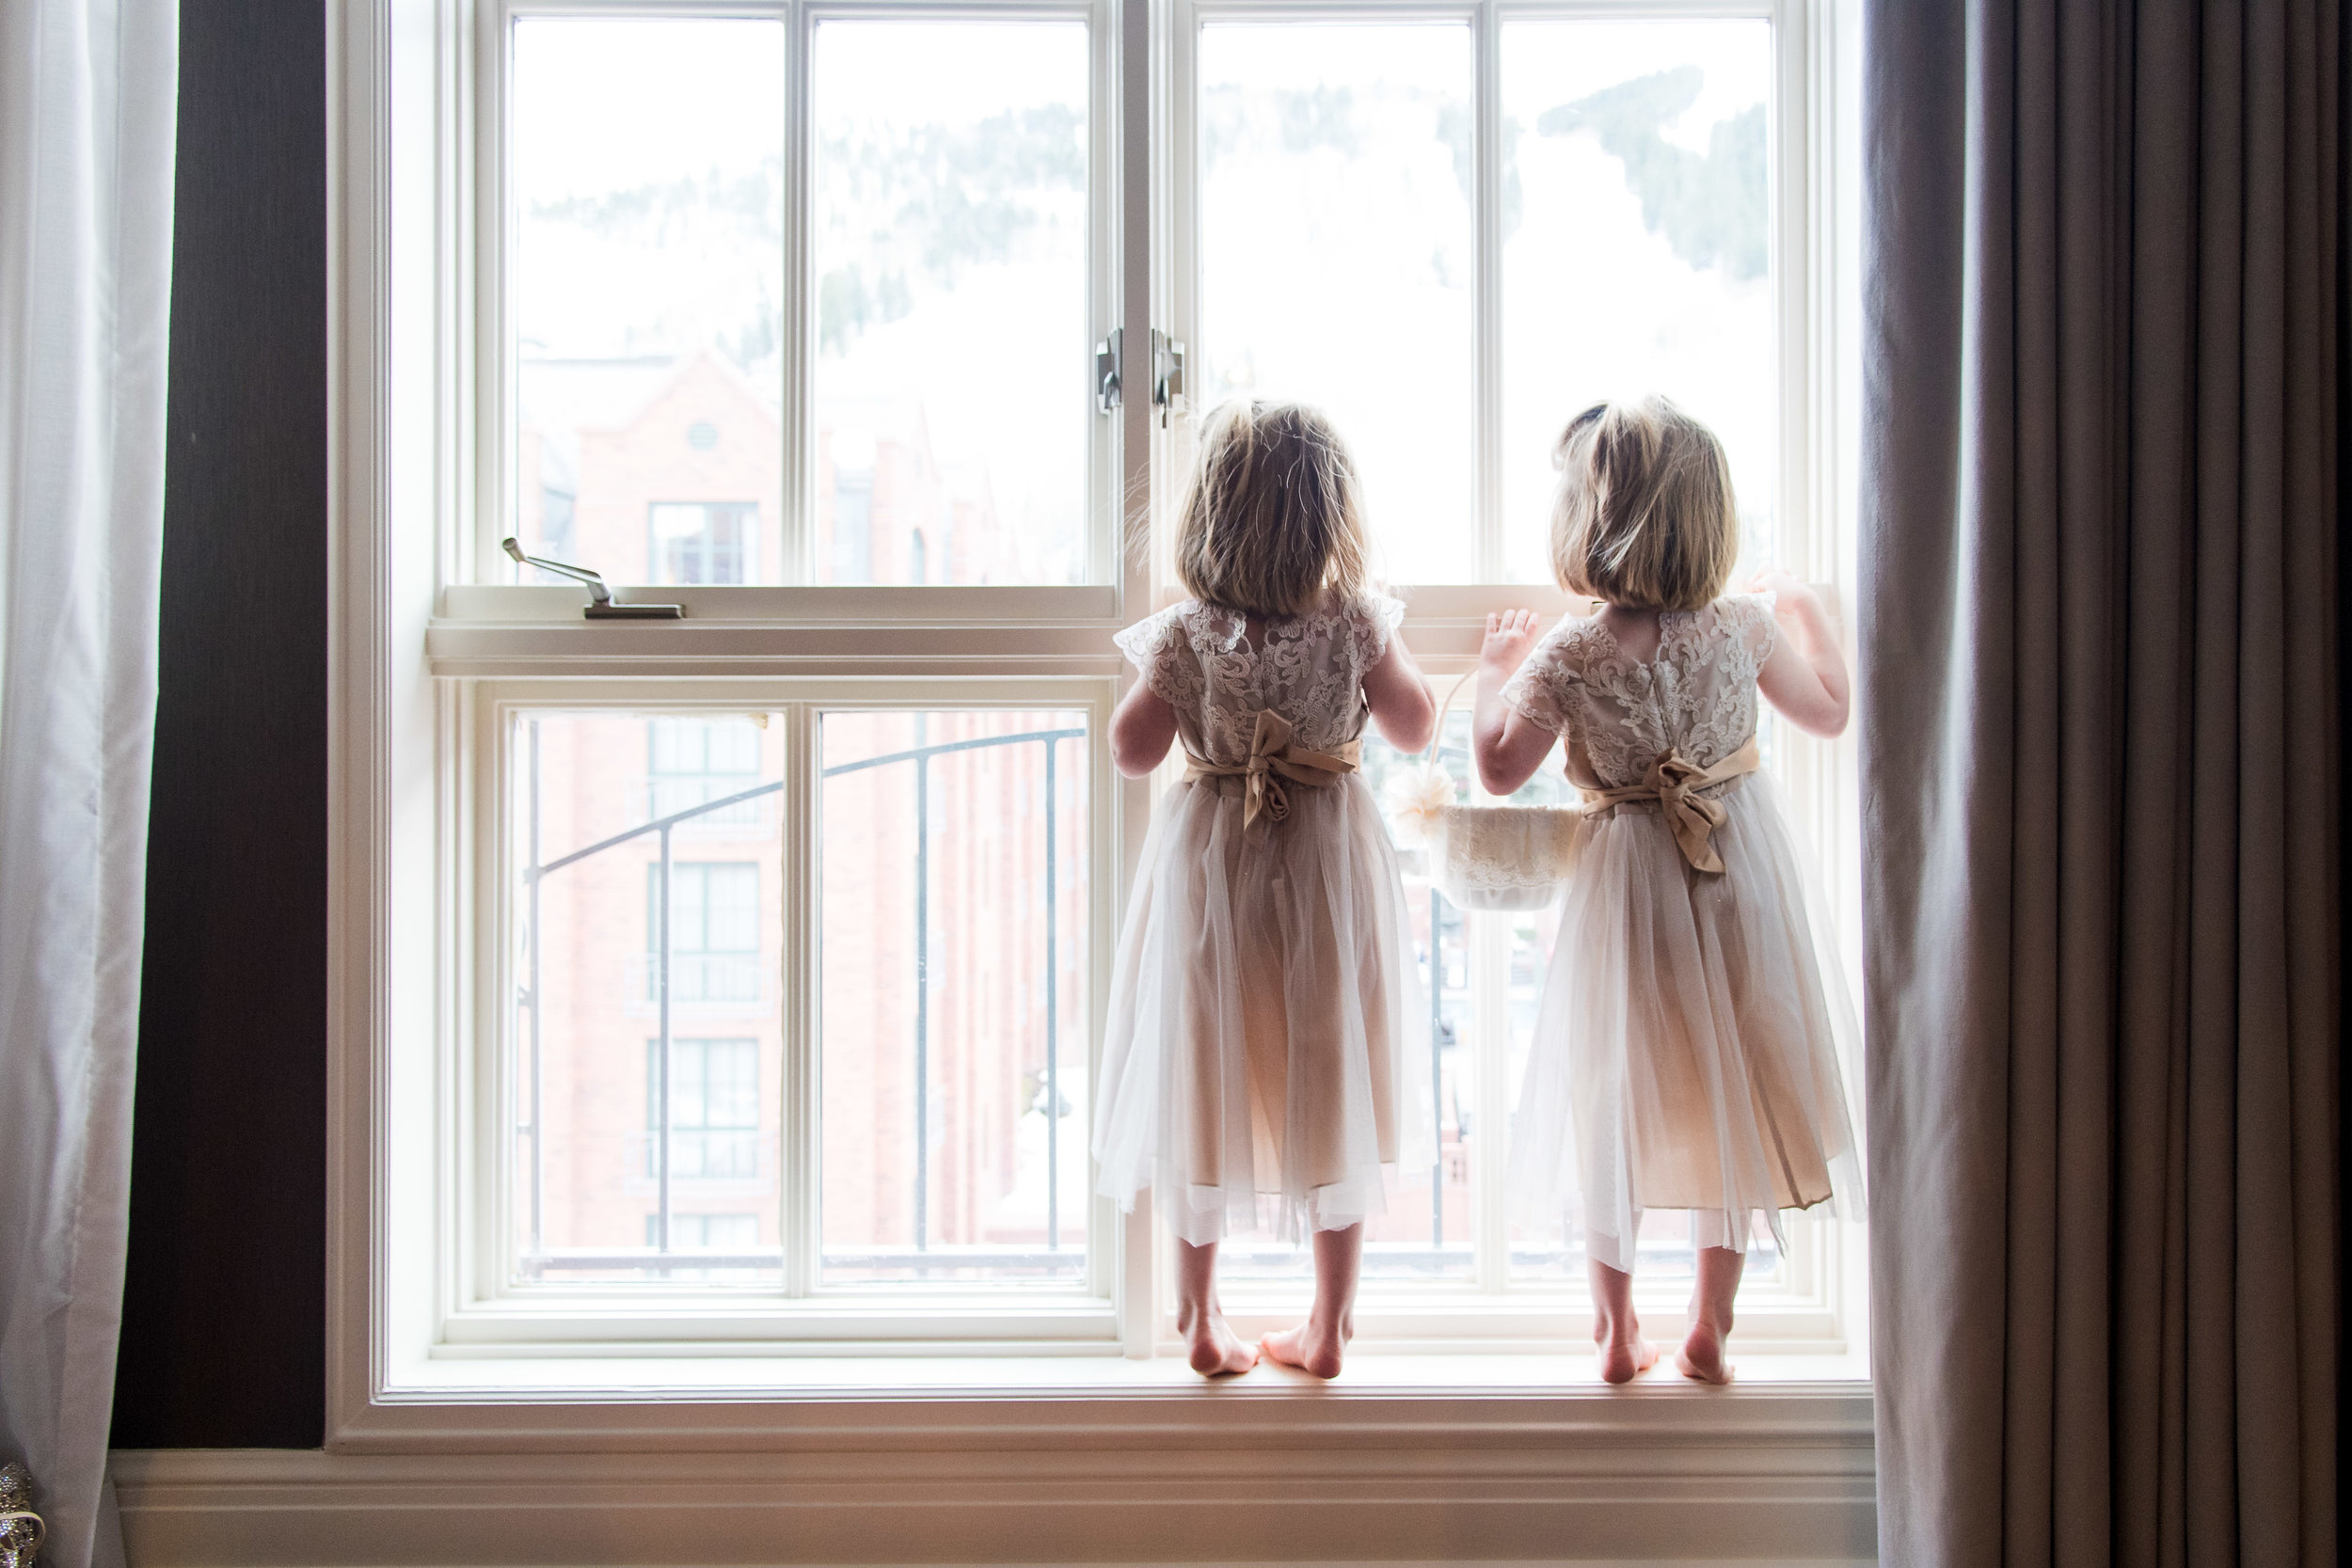 Two Flower Girls Peering Out Window